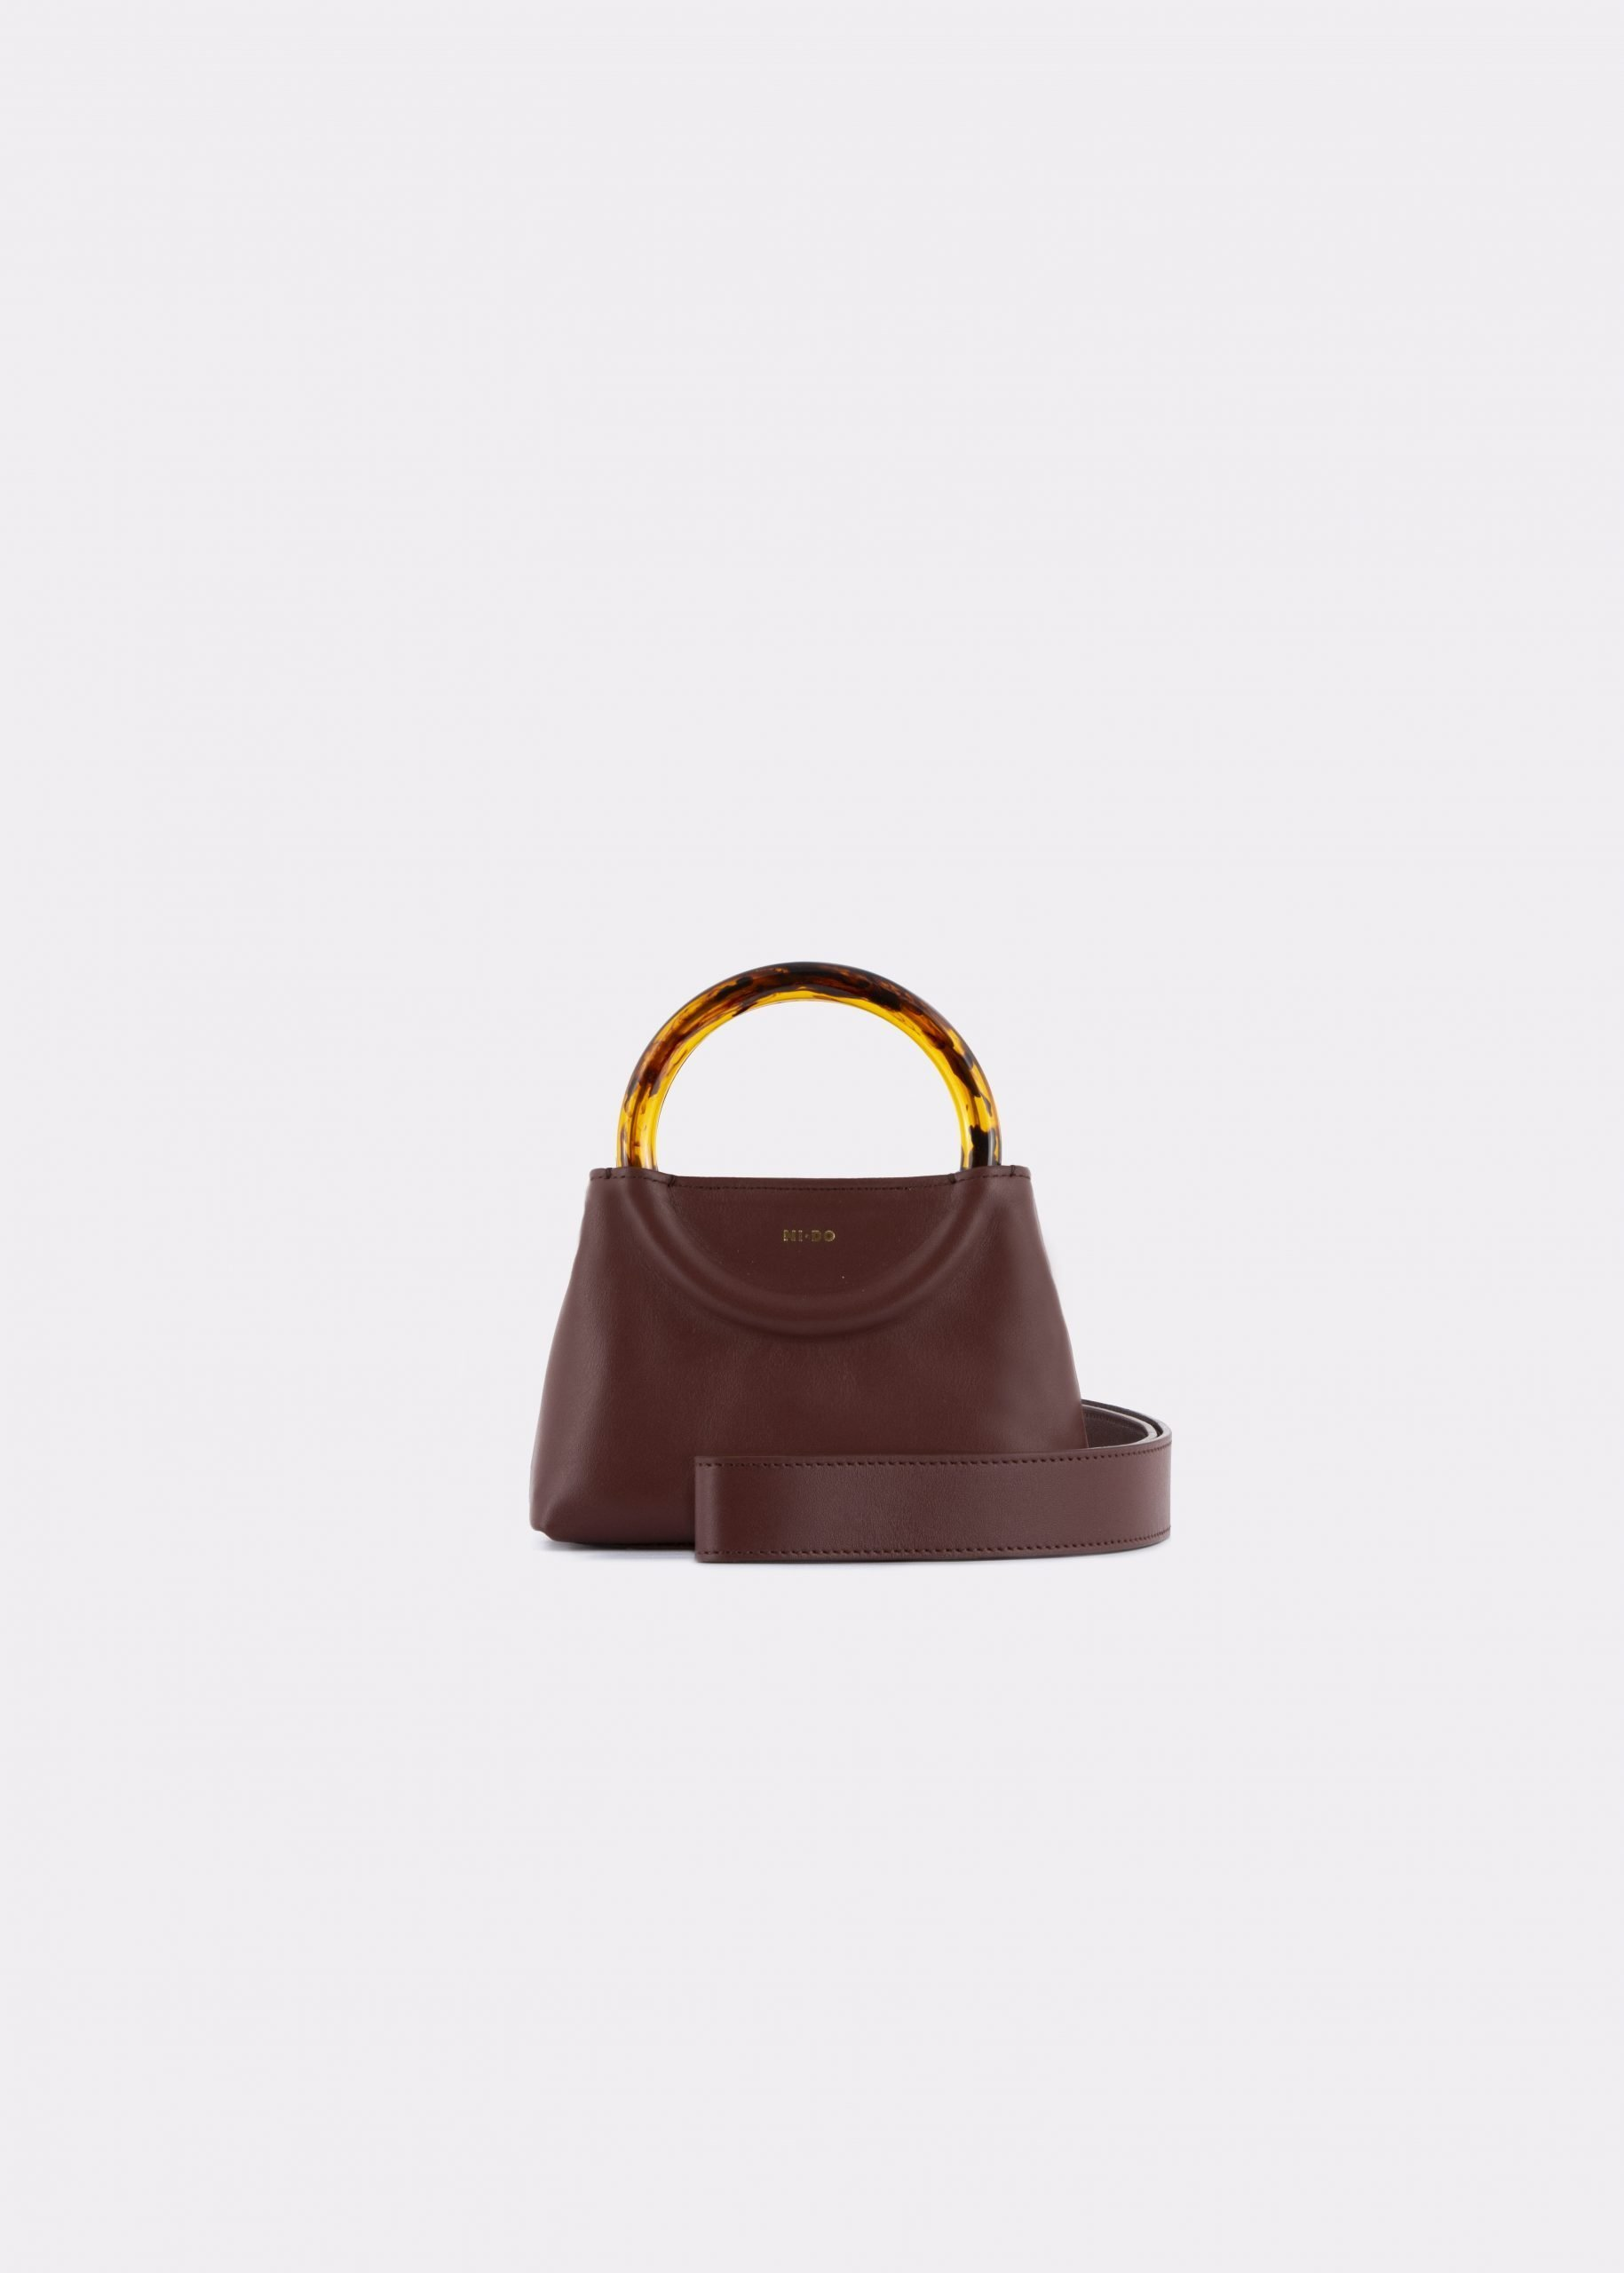 NIDO Bolla Micro bag brown leather Amber_shoulder strap view